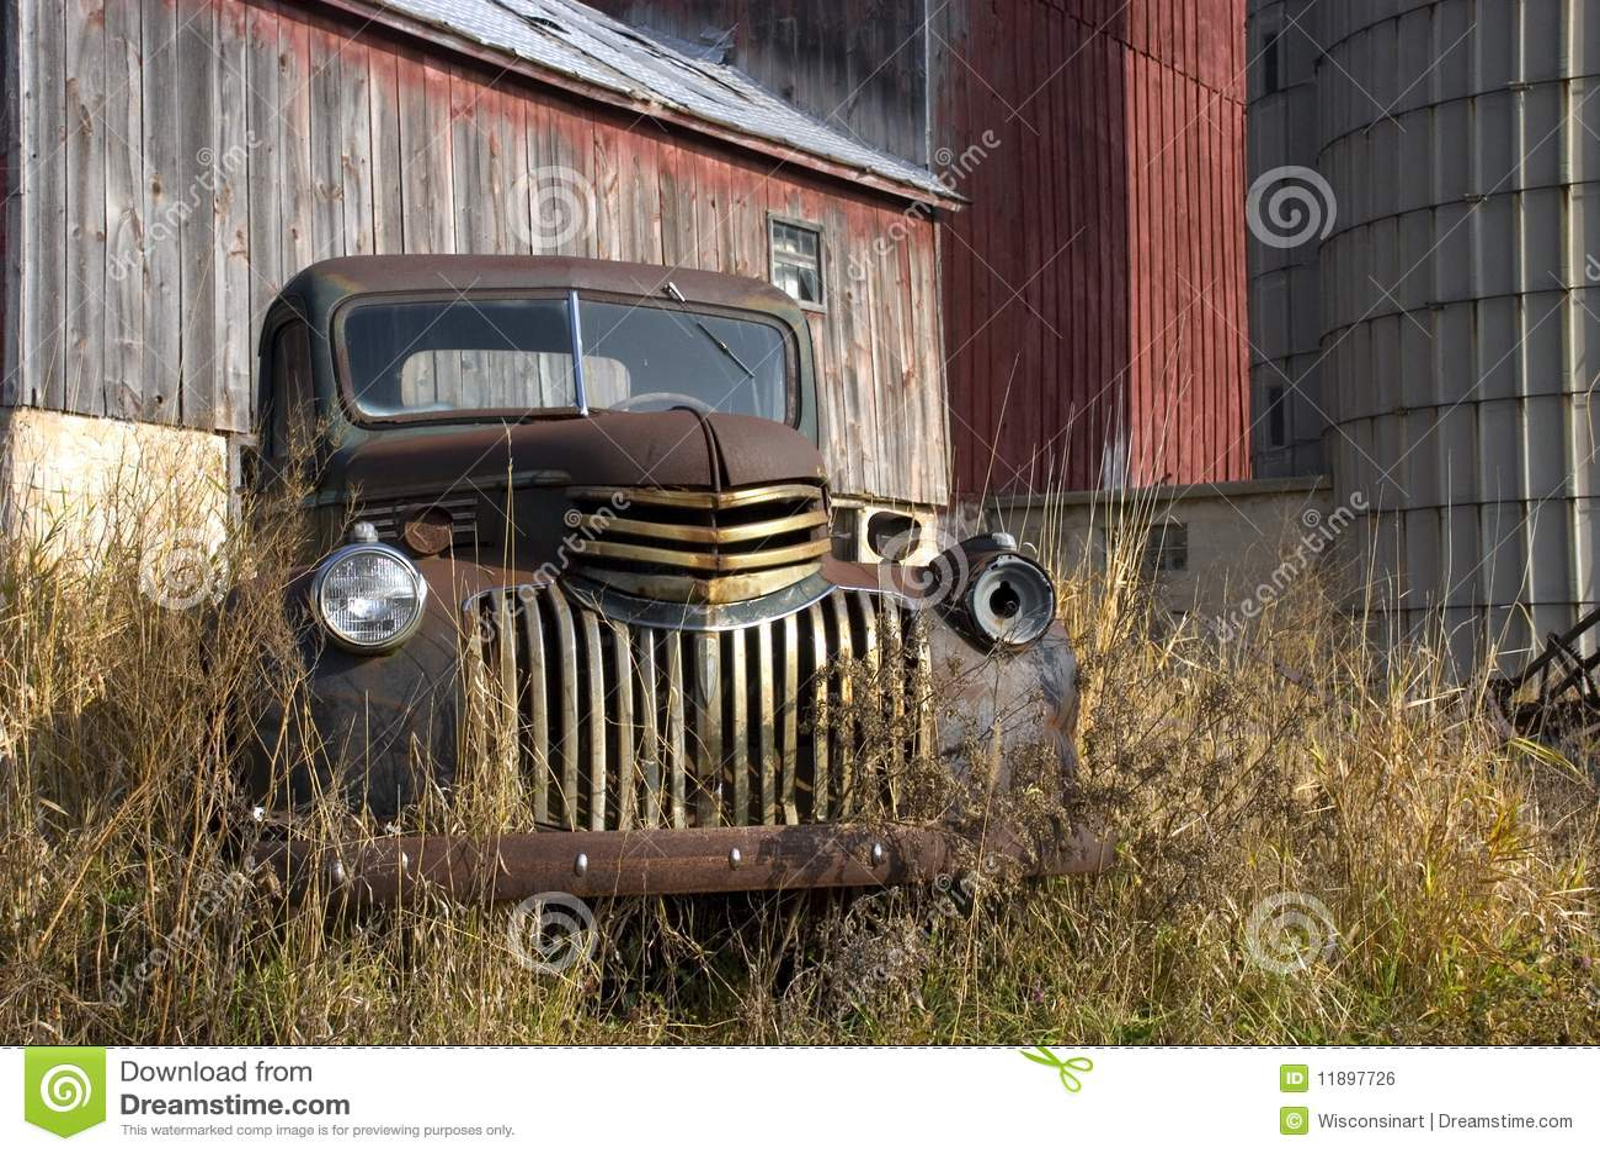 Old Vintage Farm Truck by Barn